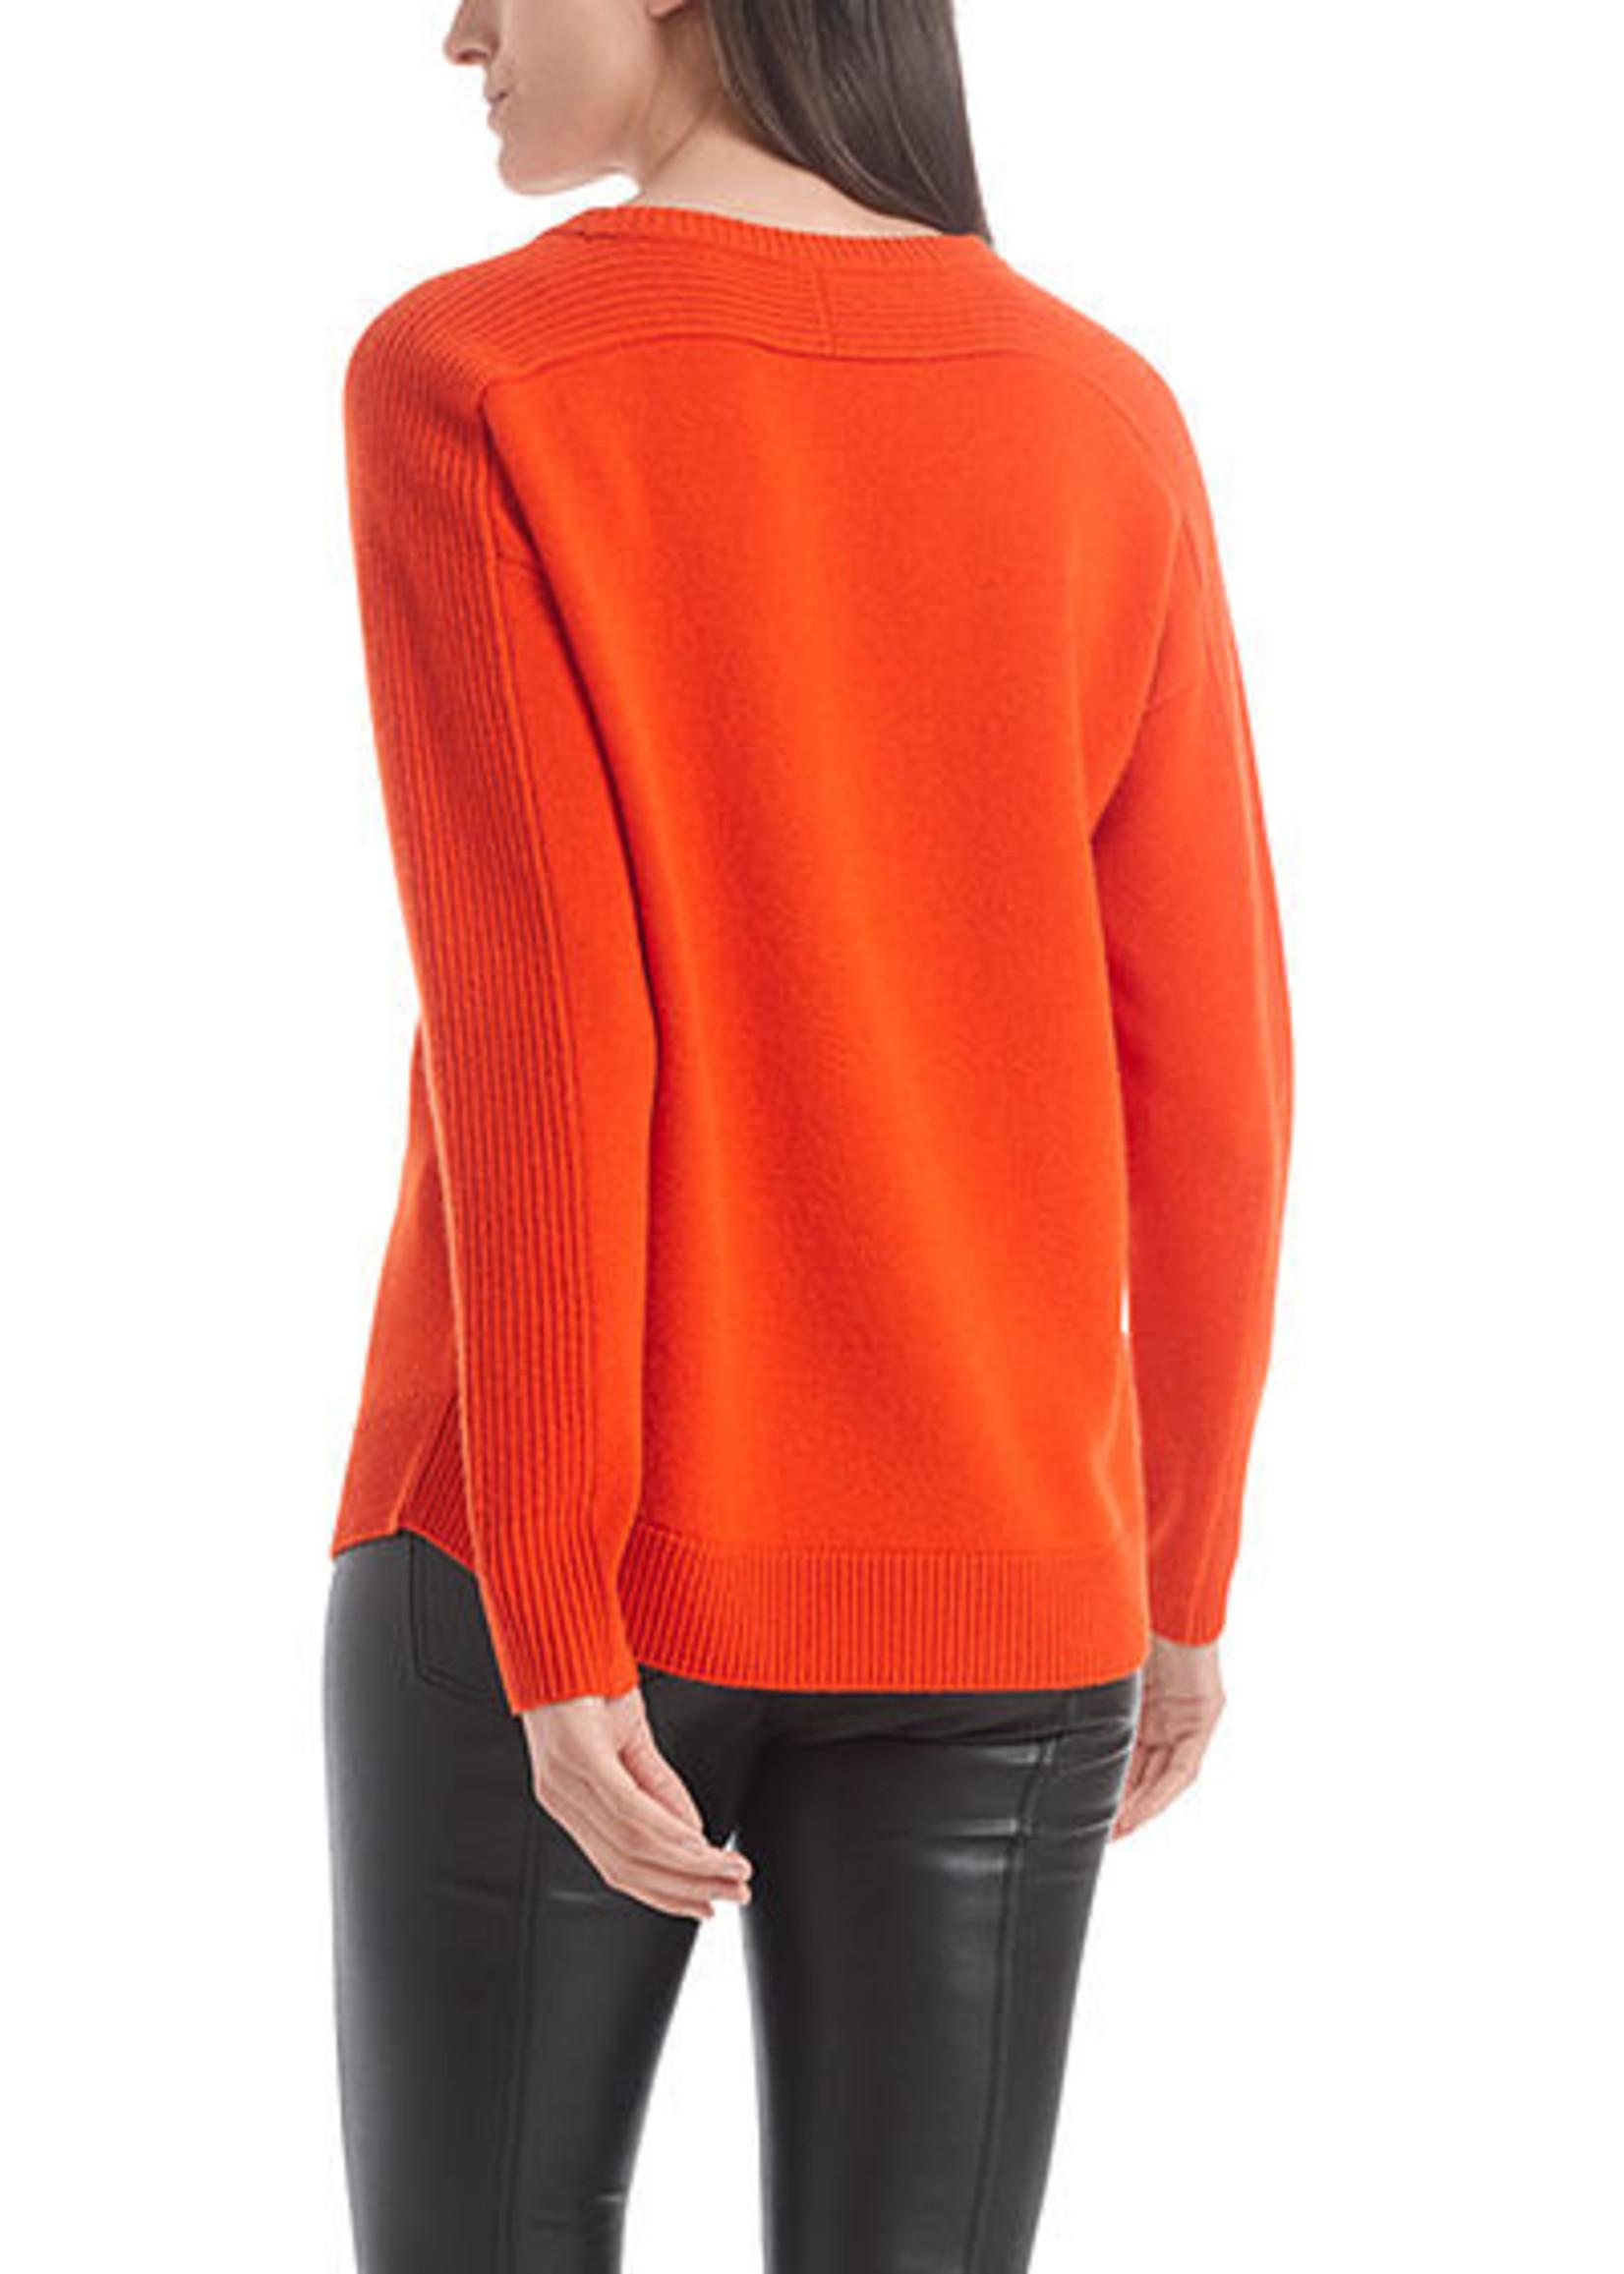 Sweater RC 41.40 M84 hokkaido